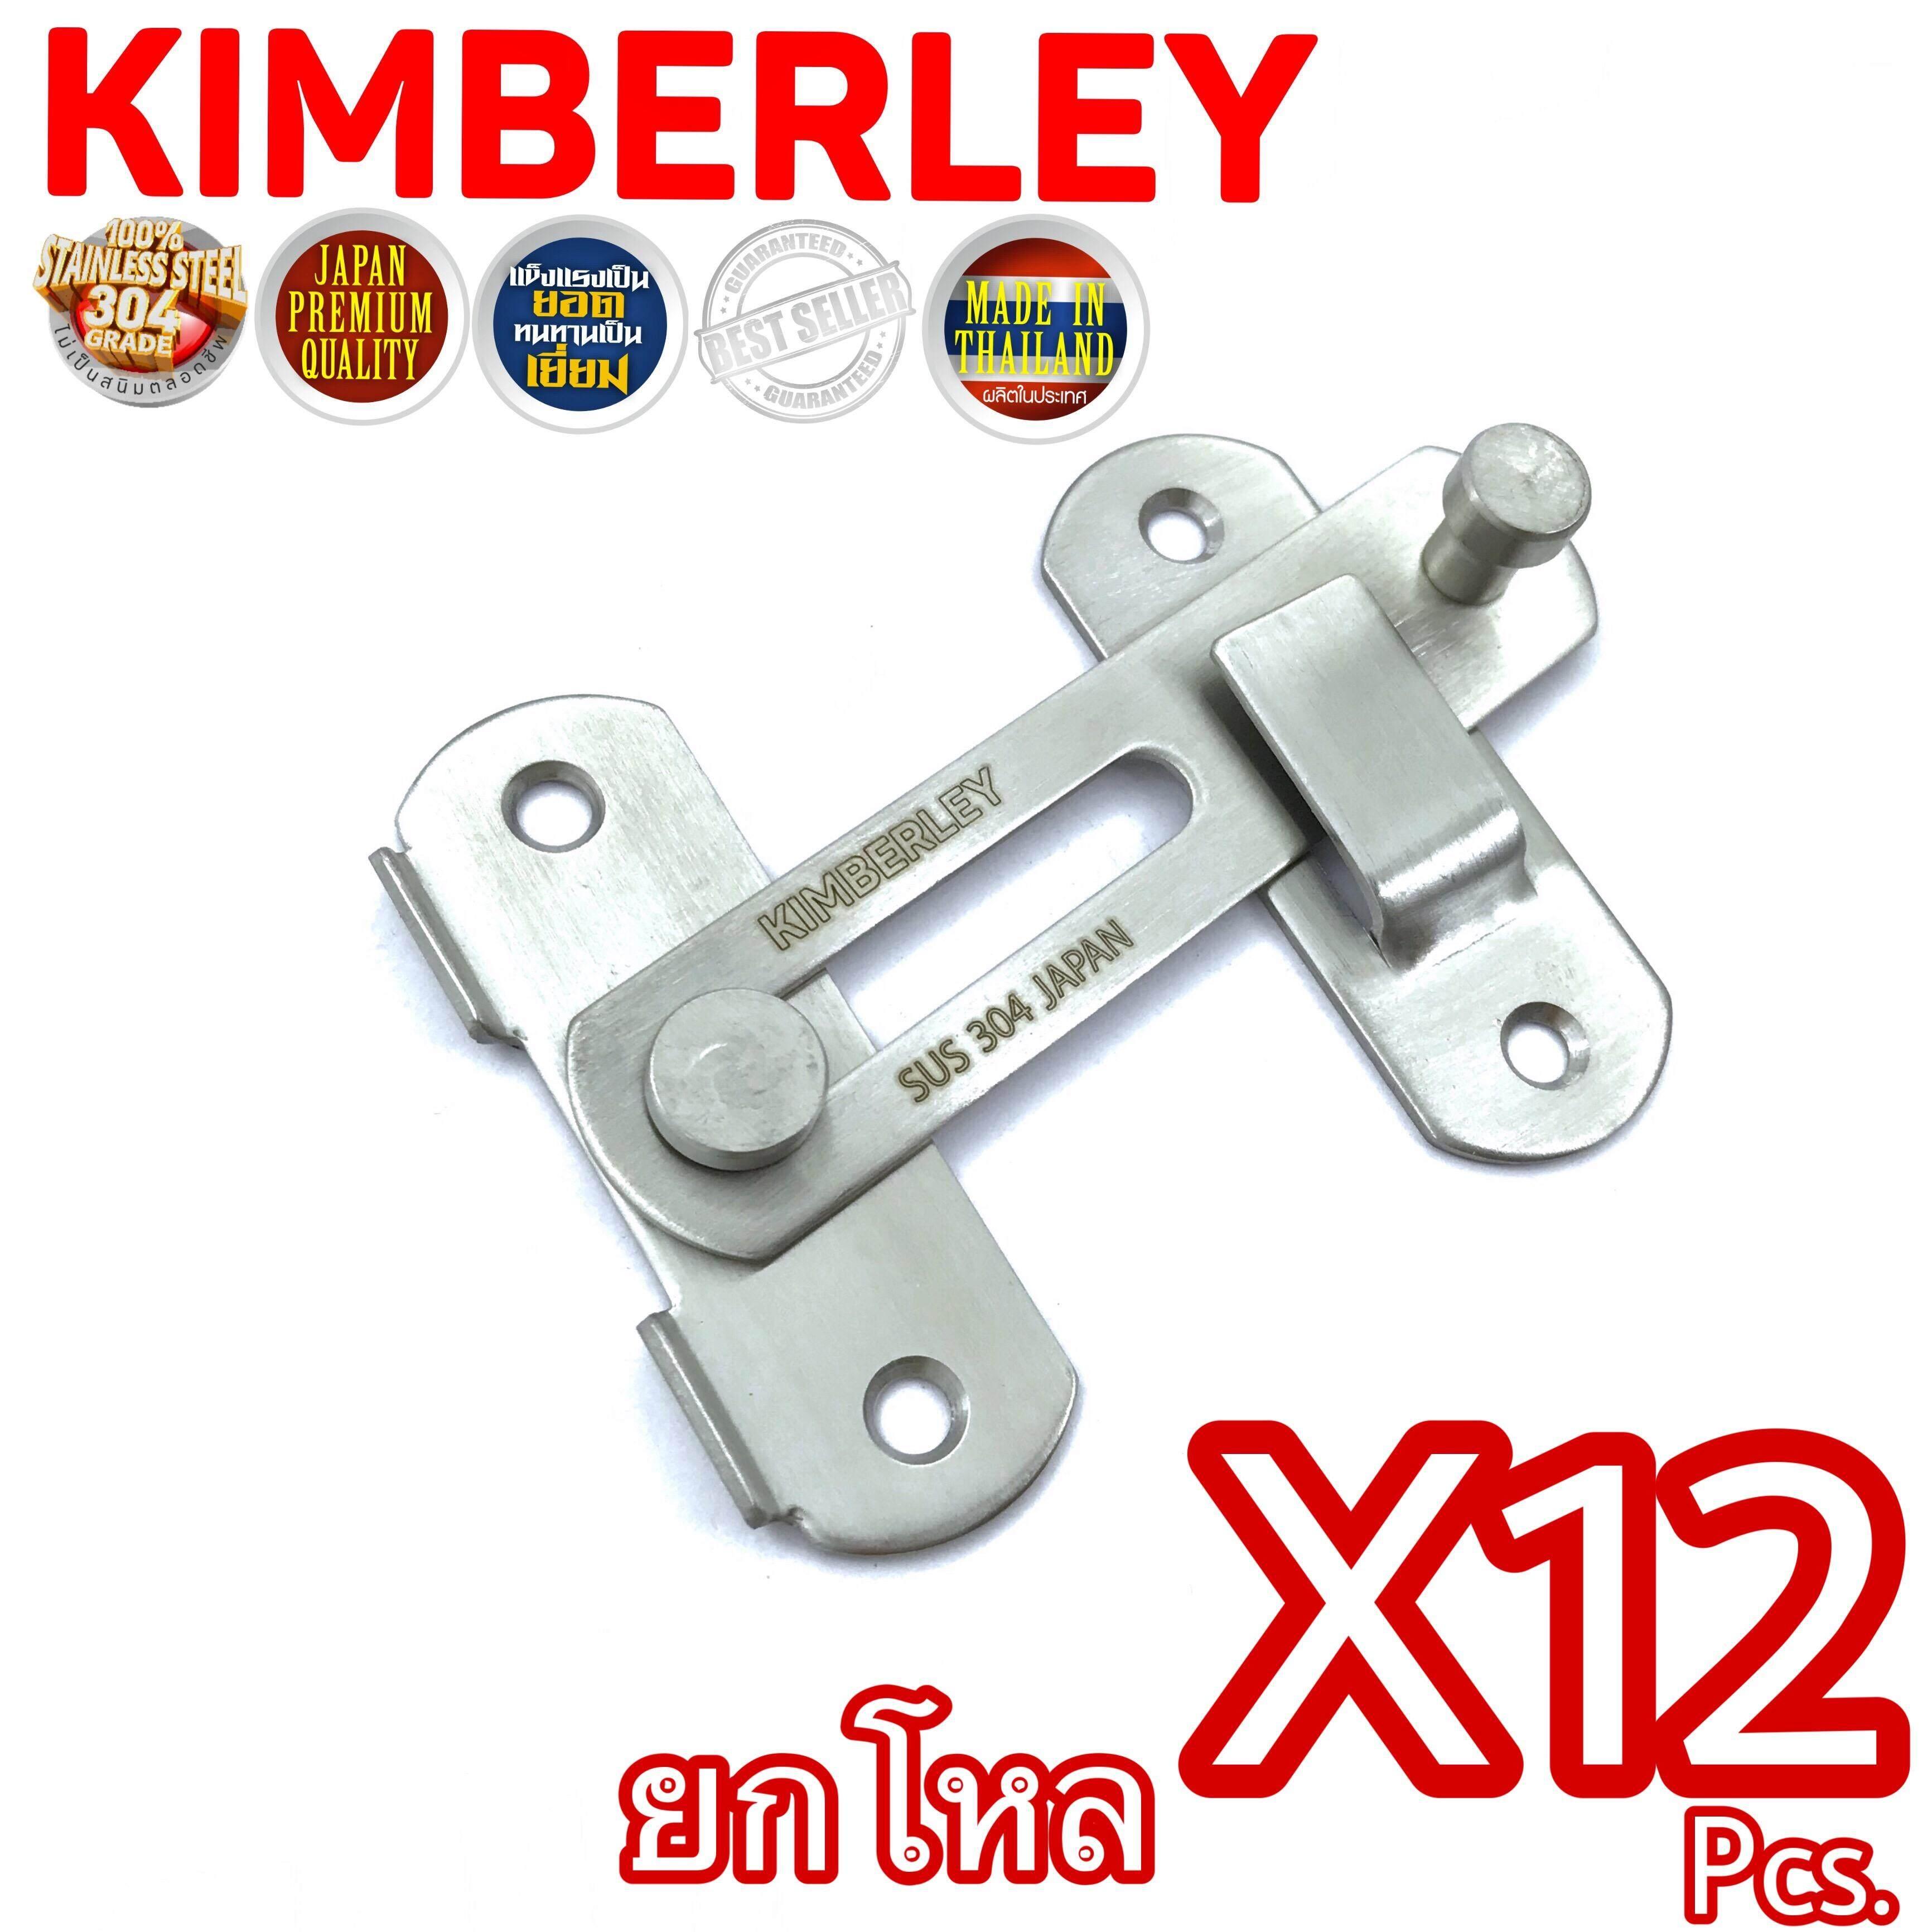 "KIMBERLEY กลอนสับประตู กลอนสับบานเลื่อน กลอนสับหน้าต่าง สแตนเลสแท้ NO.599-4"" SS (SUS 304 JAPAN)(12 ชิ้น)"